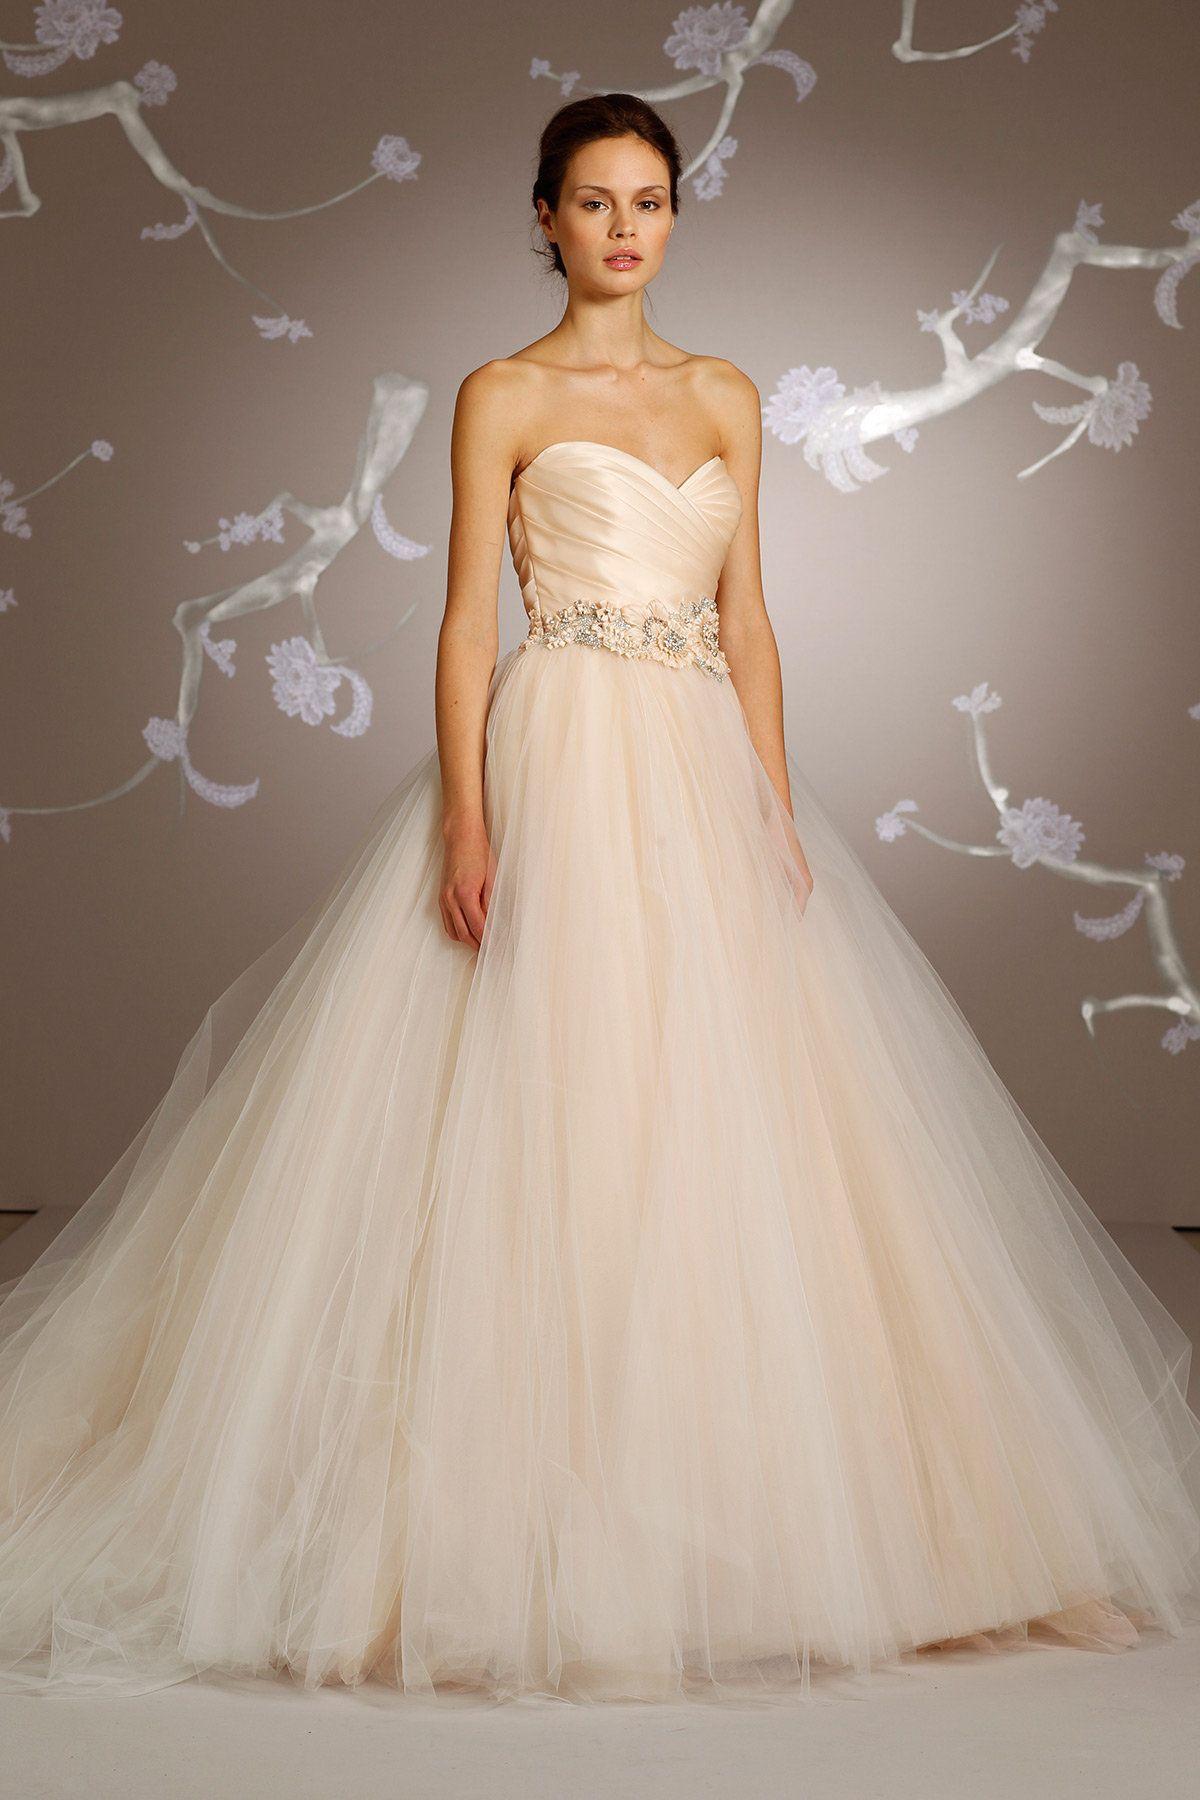 https://www.bridalreflections.com/wp-content/uploads/2021/07/lazaro-bridal-tulle-ball-gown-pleated-silk-satin-organza-floral-jewel-natural-waist-circular-chapel-train-3108_lg_lb.jpg